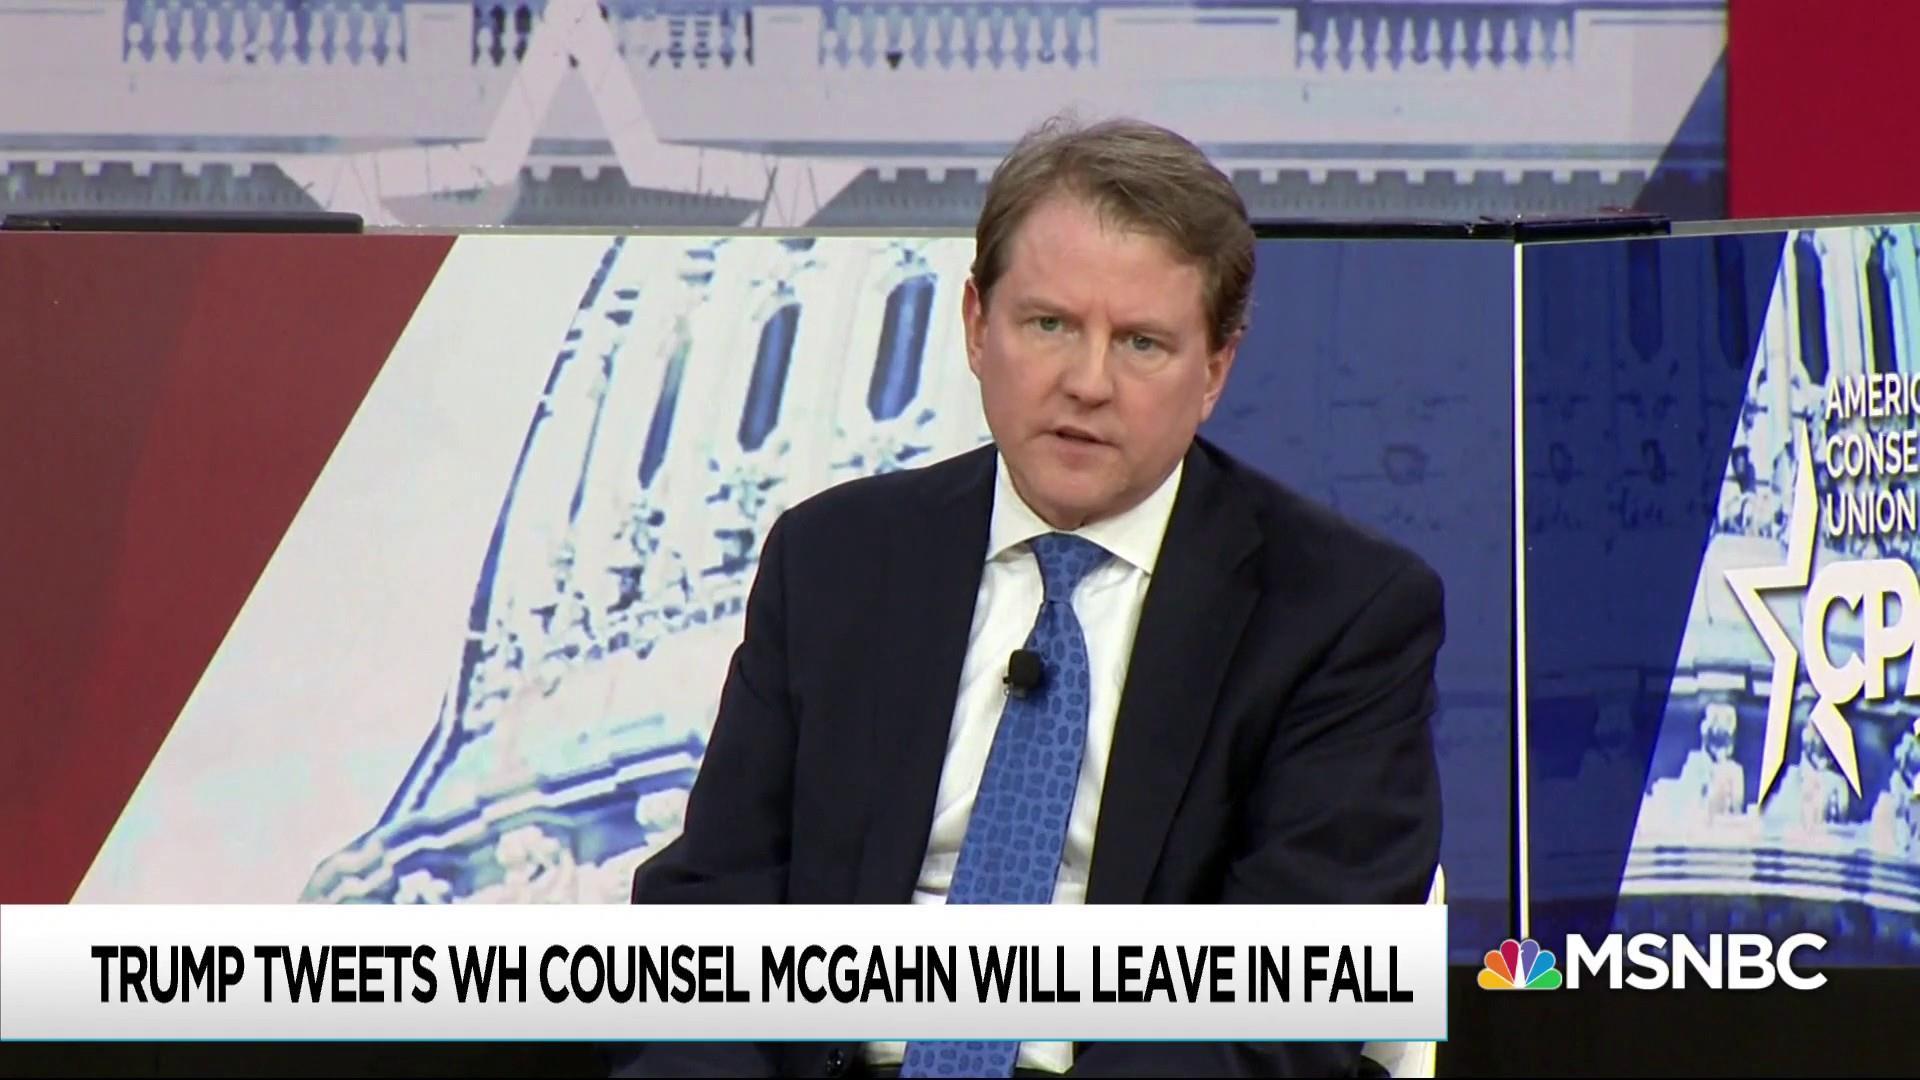 Trump surprises McGahn with departure tweet as legal messes grow